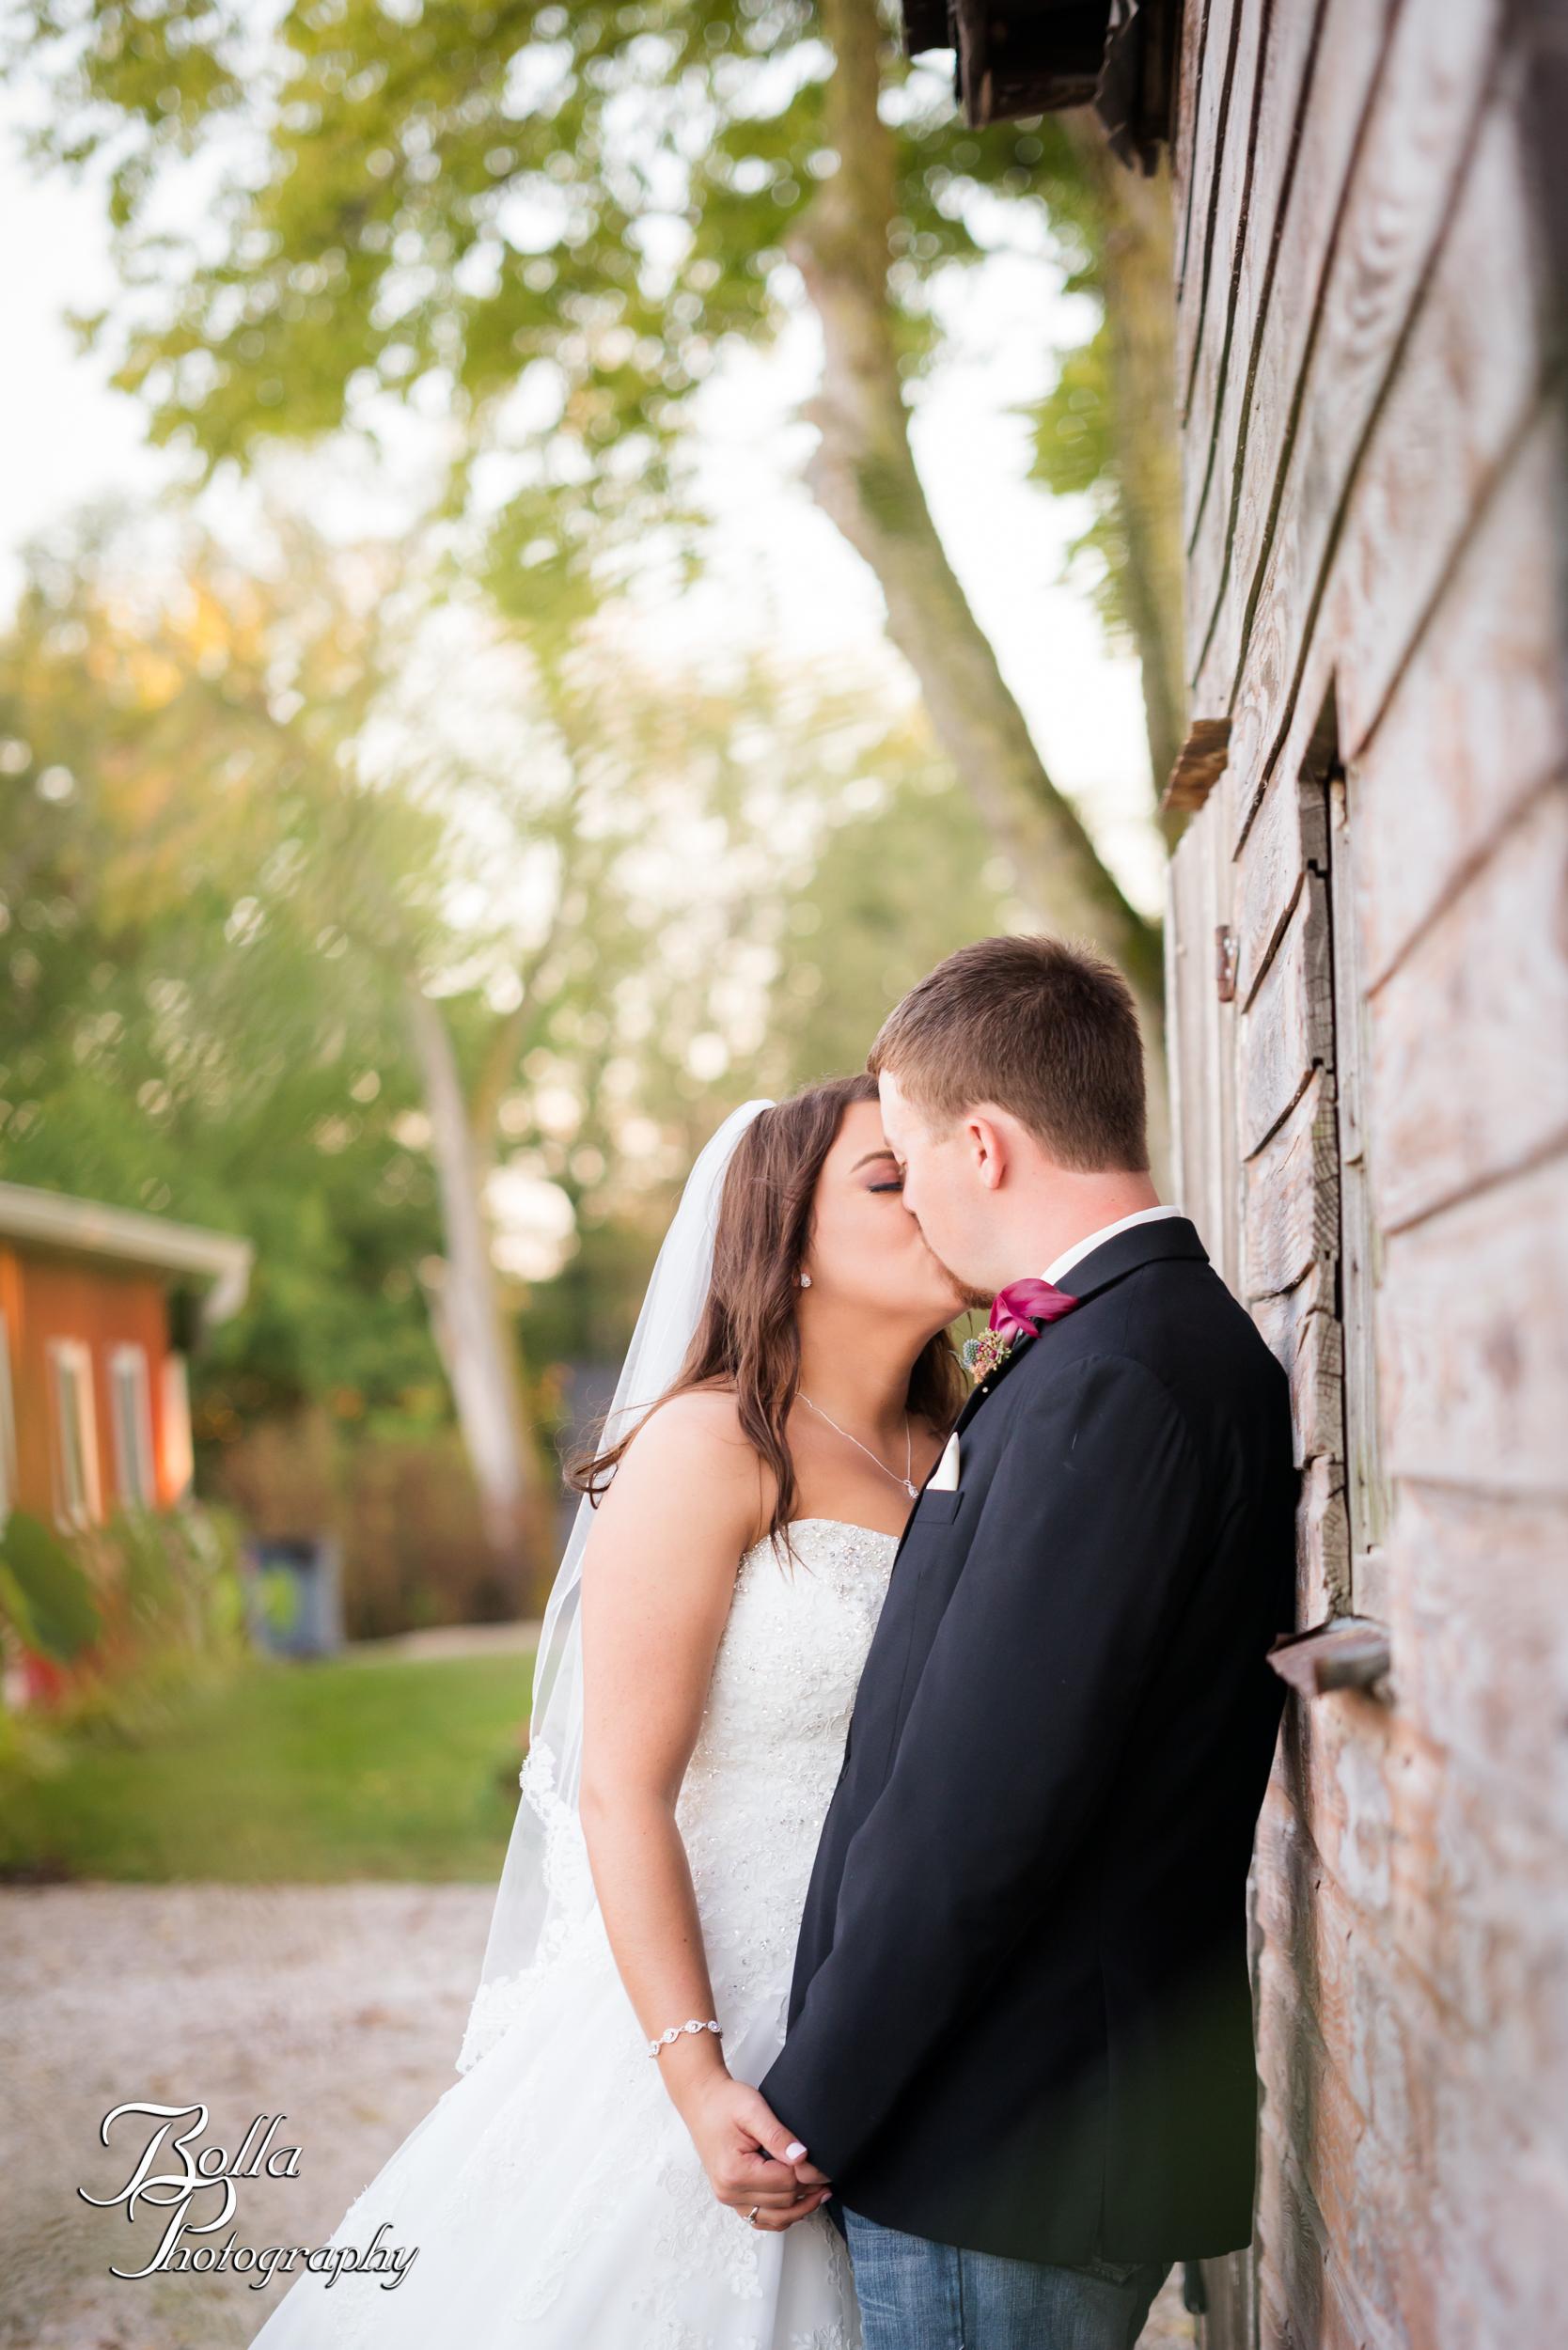 Bolla_photography_edwardsville_wedding_photographer_st_louis_weddings_Amber_Korsmeyer_Kyle_Gruner_Schwarz_Barn_blue_jeans_pickup_truck_autumn-0333.jpg